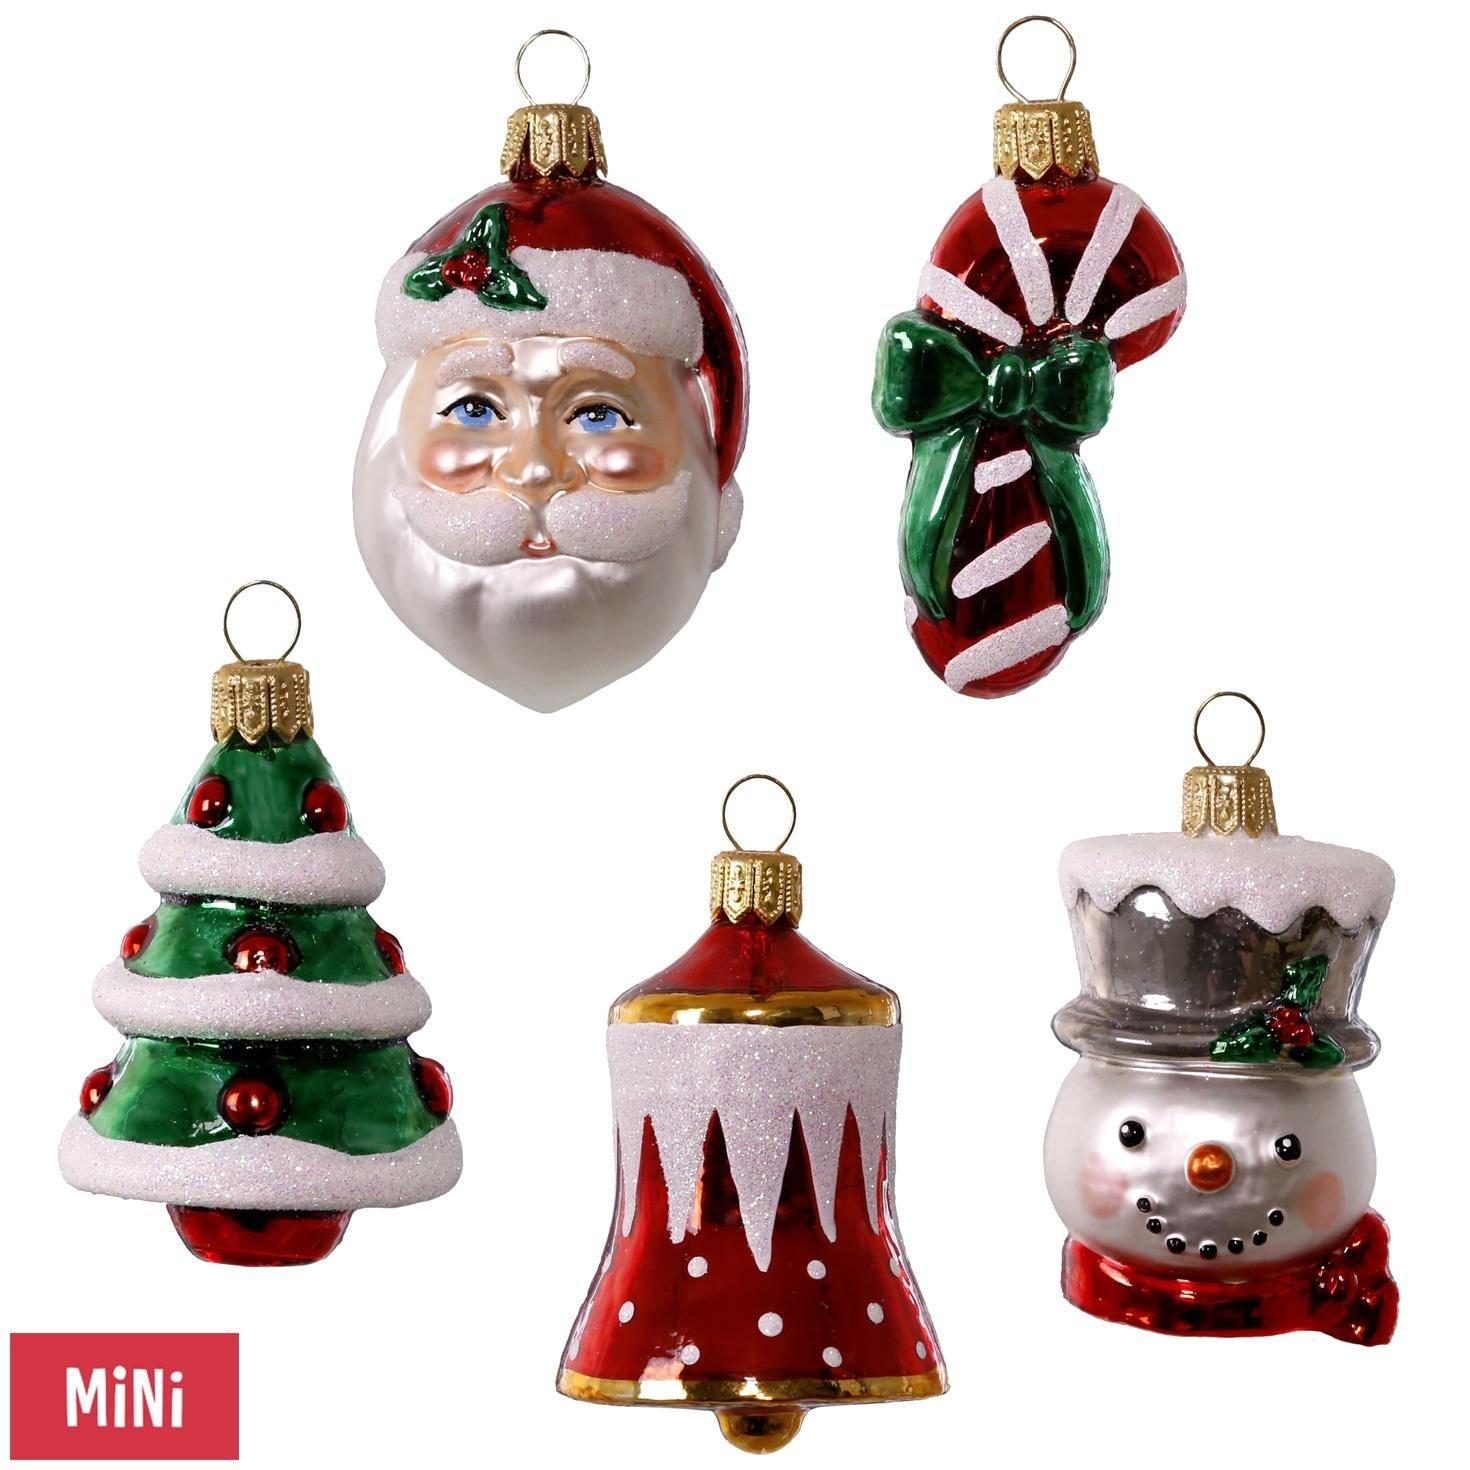 Hallmark Keepsake 2017 Symbols of the Season Premium Mini Blown Glass Christmas Ornaments, Set of 5